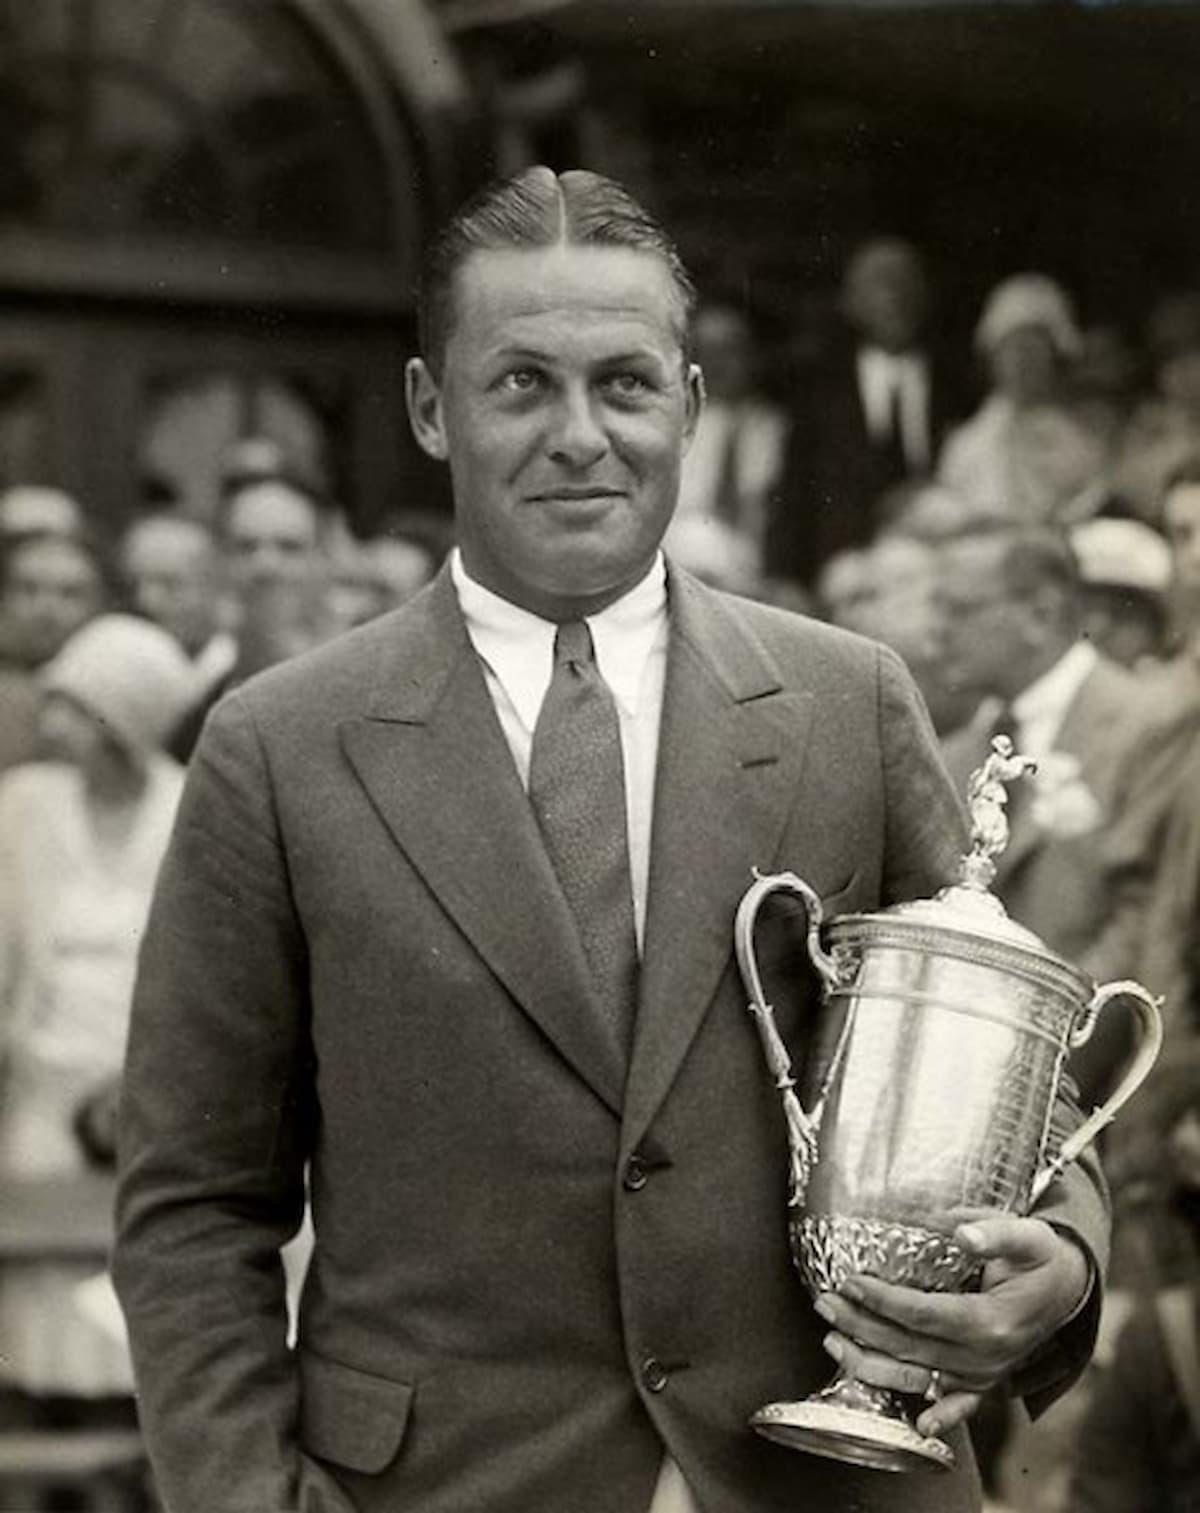 Bobby-Jones-Nguoi-sang-lap-giai-golf-The-Masters